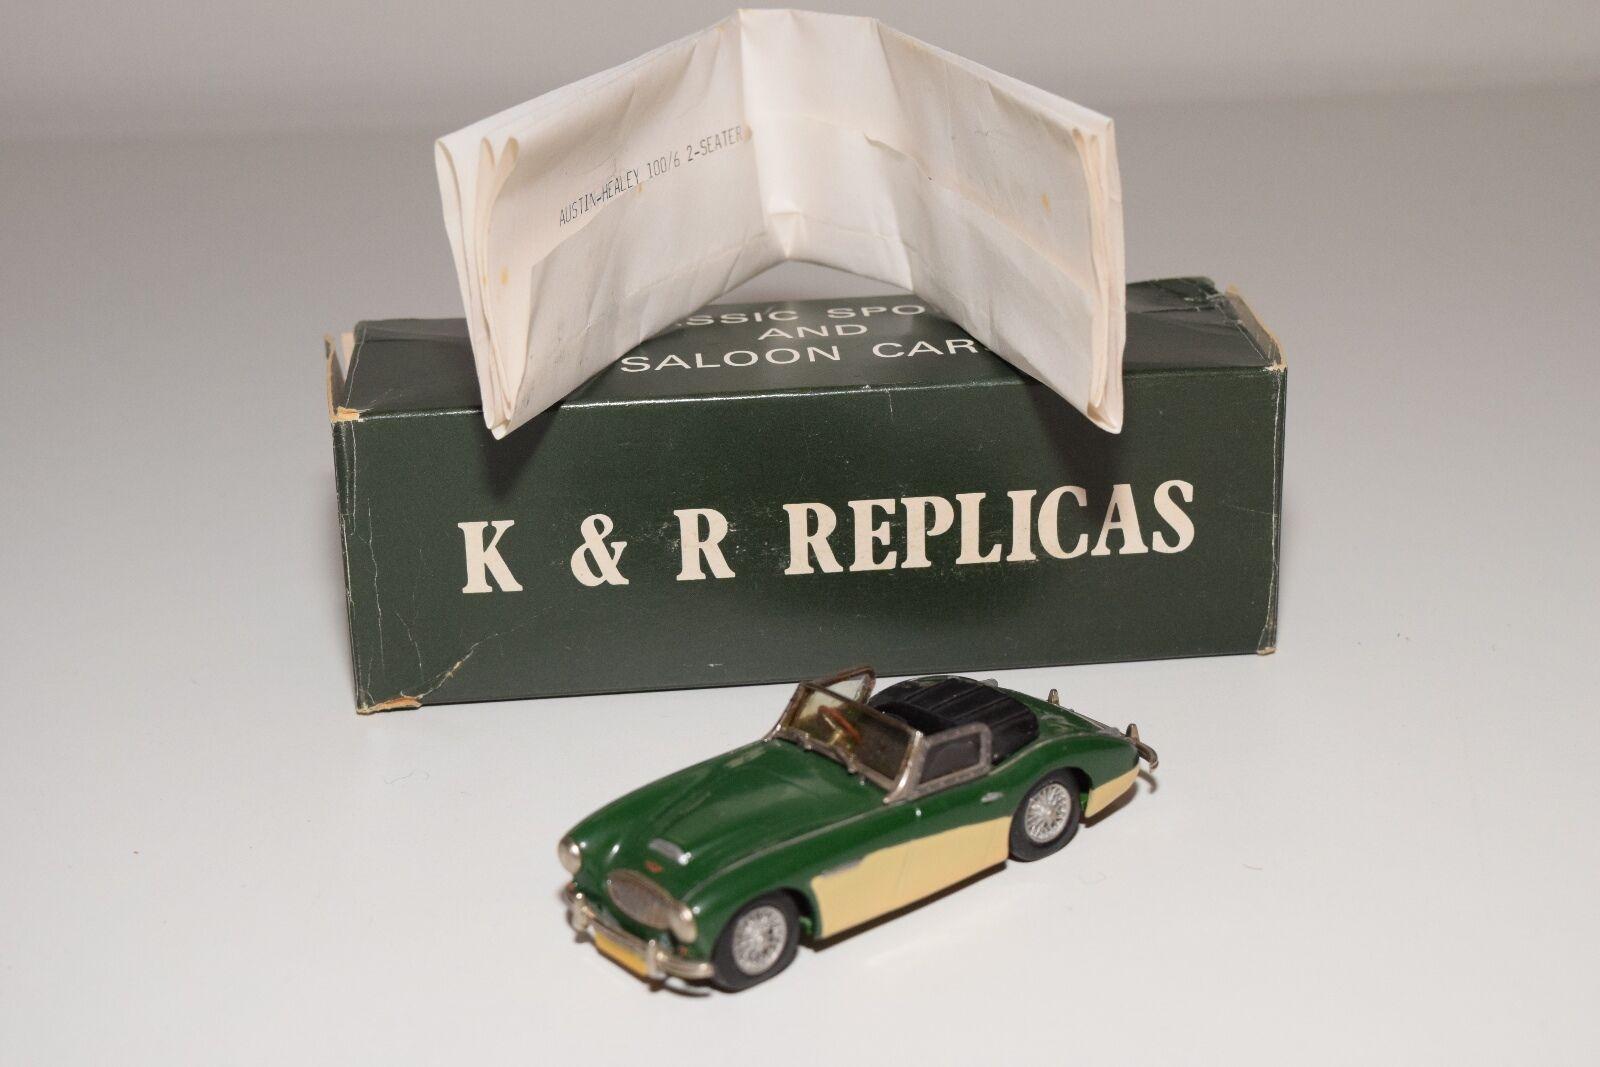 K&R REPLICAS HANDBUILD KR32 AUSTIN HEALEY 100 100 100 6 2 SEATER verde CREAM NMINT BOXED 5ff750